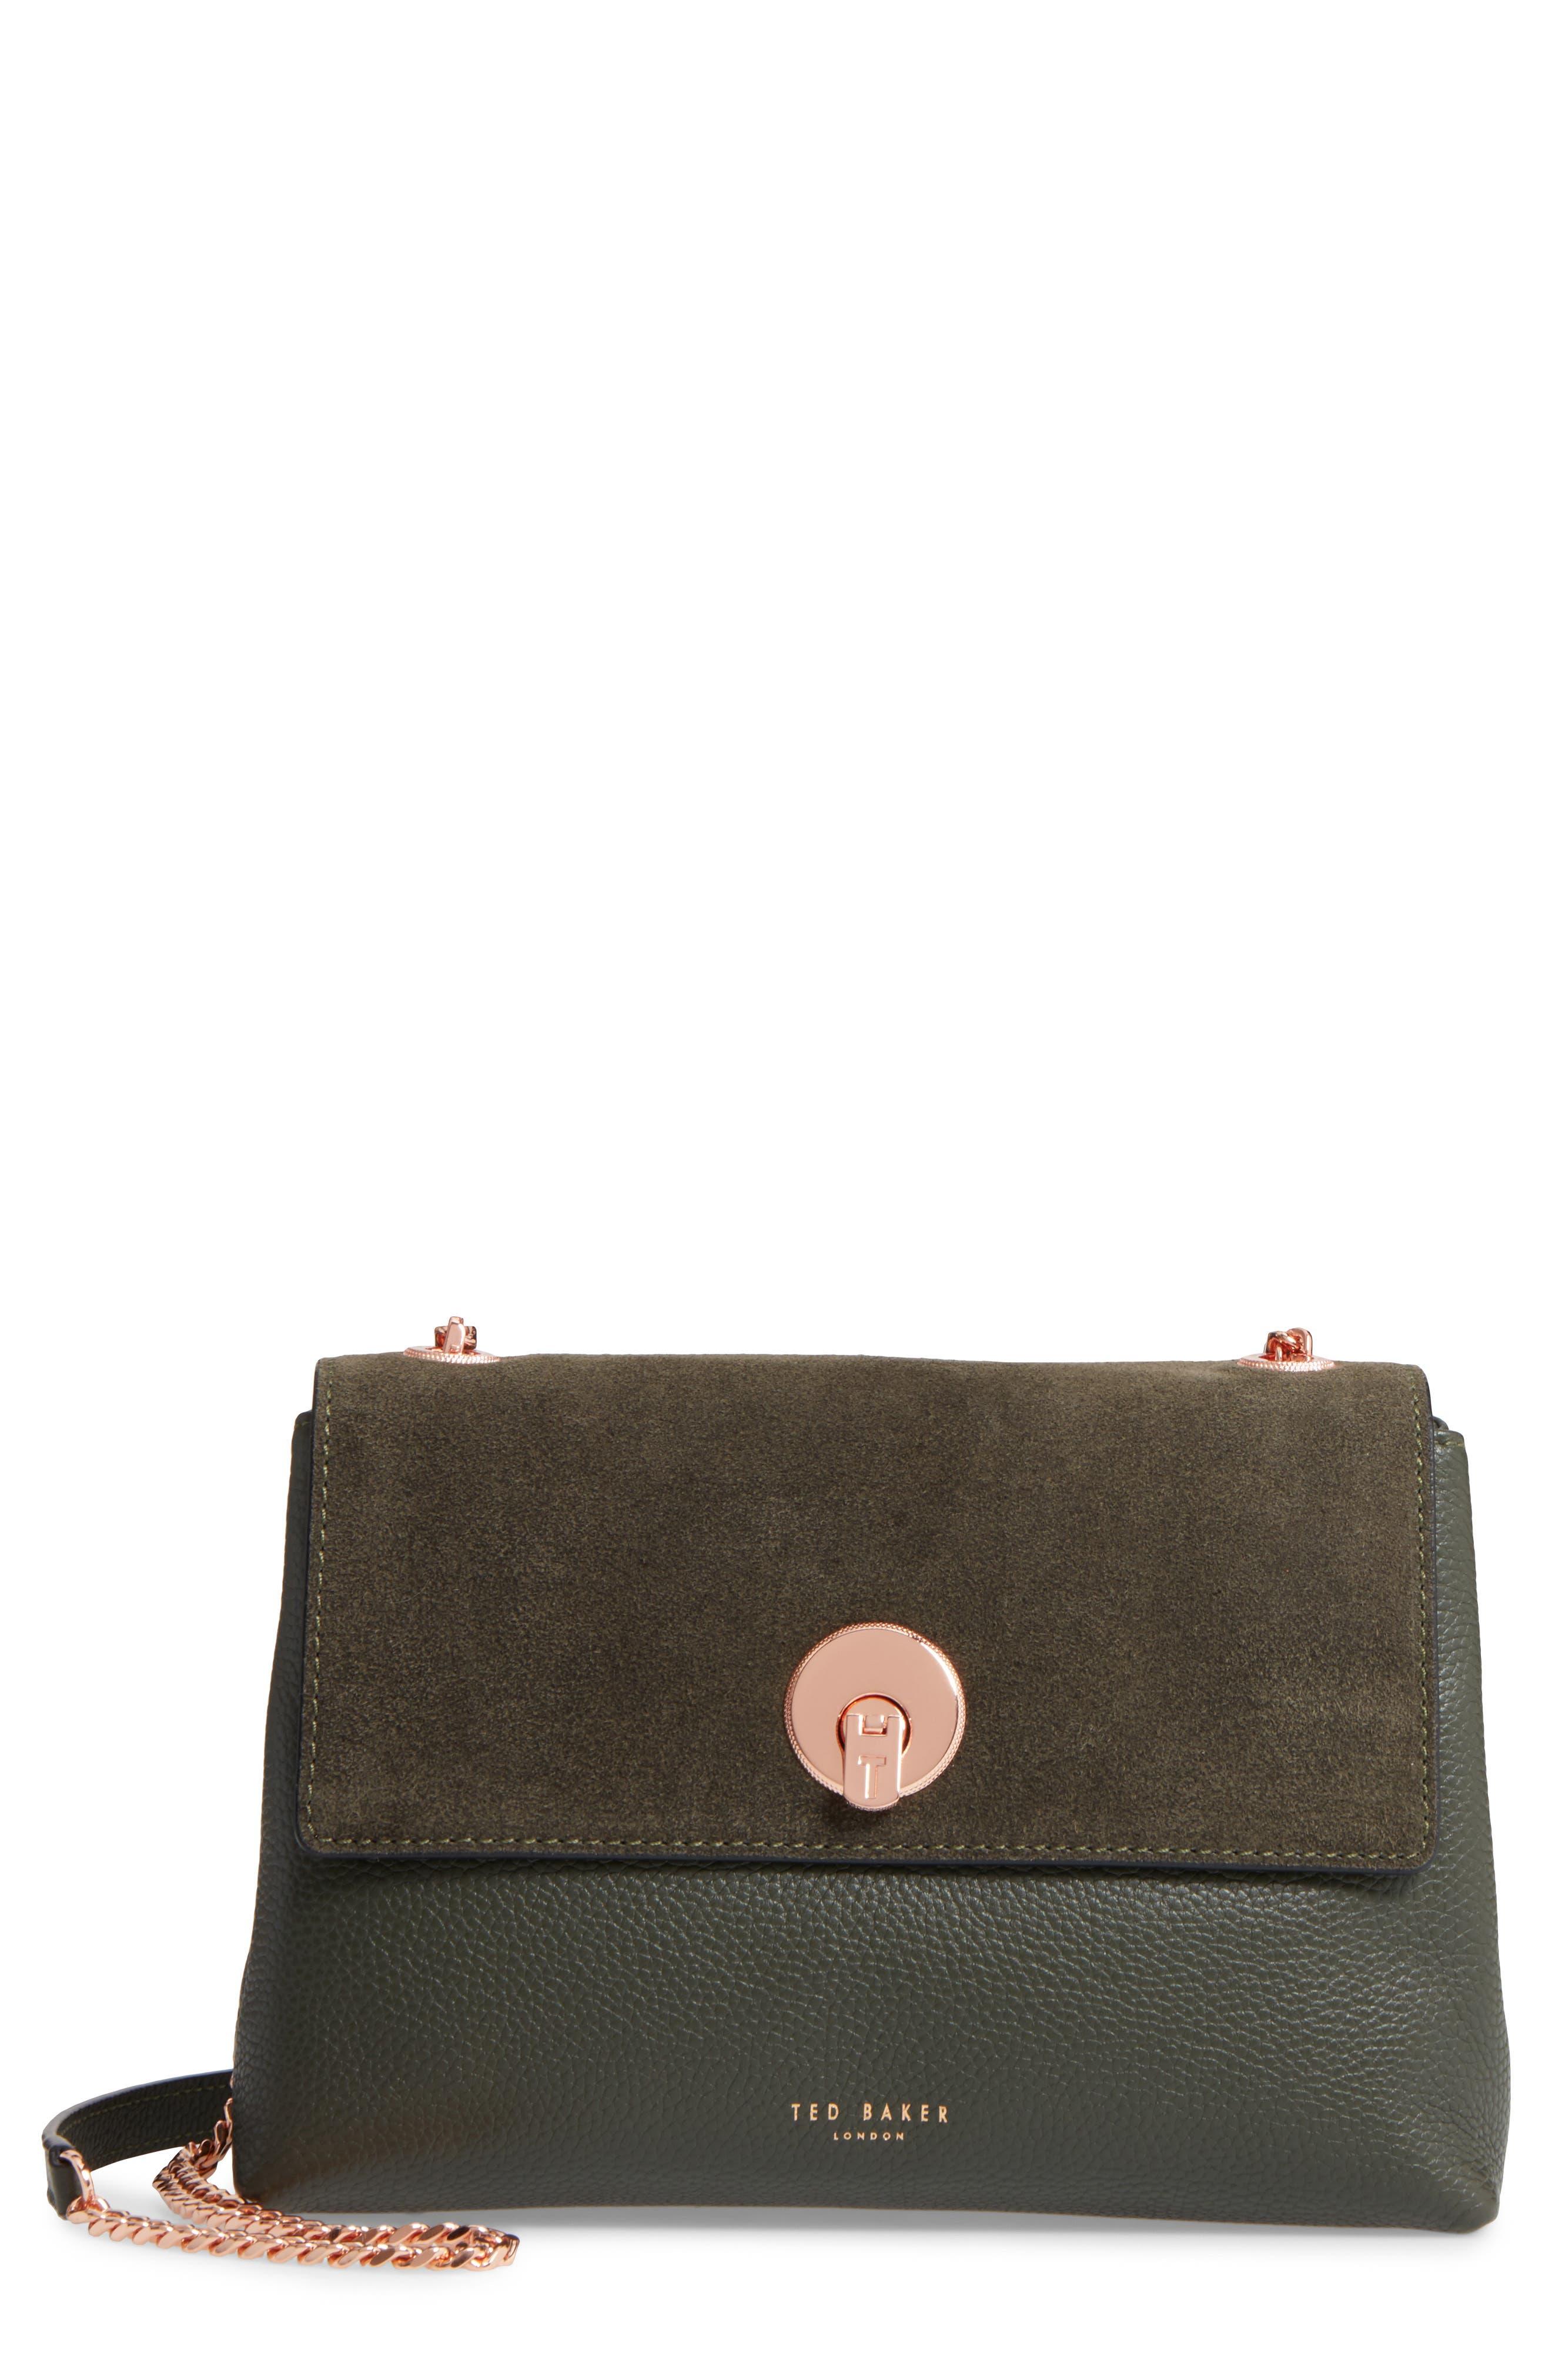 Sorikai Leather & Suede Crossbody Bag,                         Main,                         color, 312